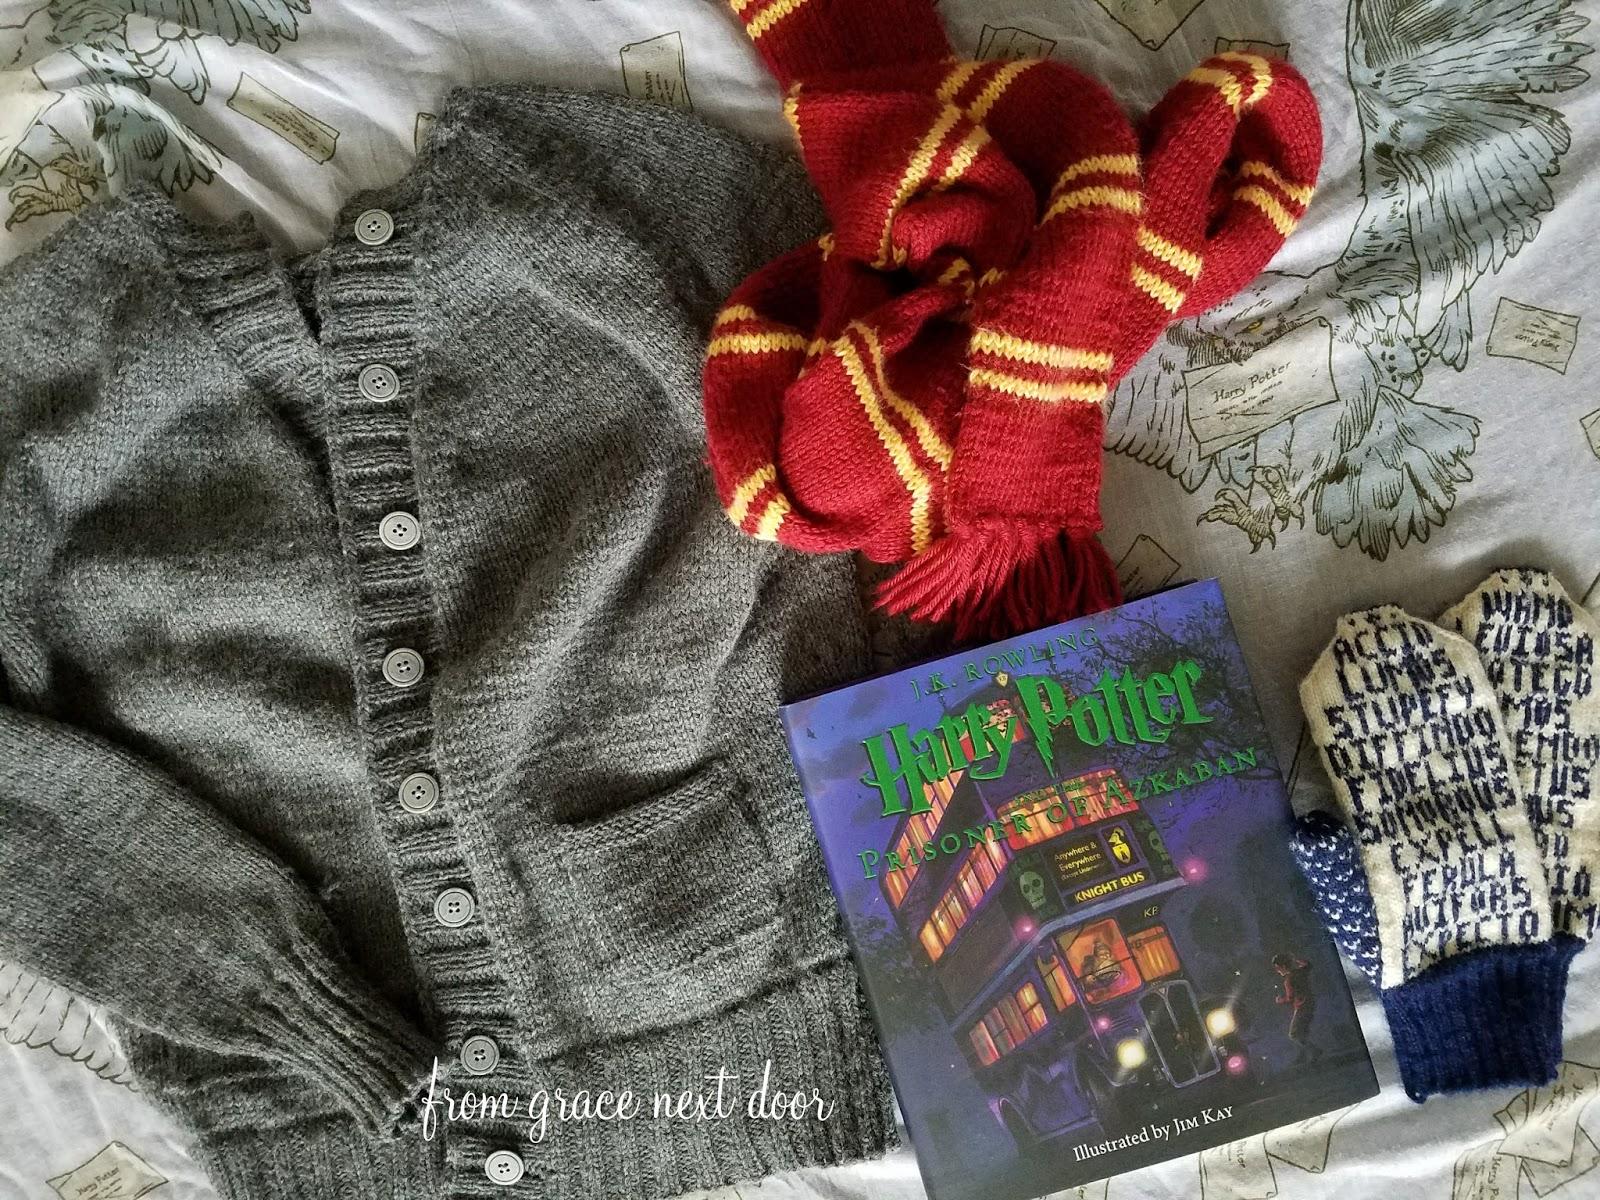 From Grace Next Door Harry Potter Sweater Ginnys Owl Cardigan